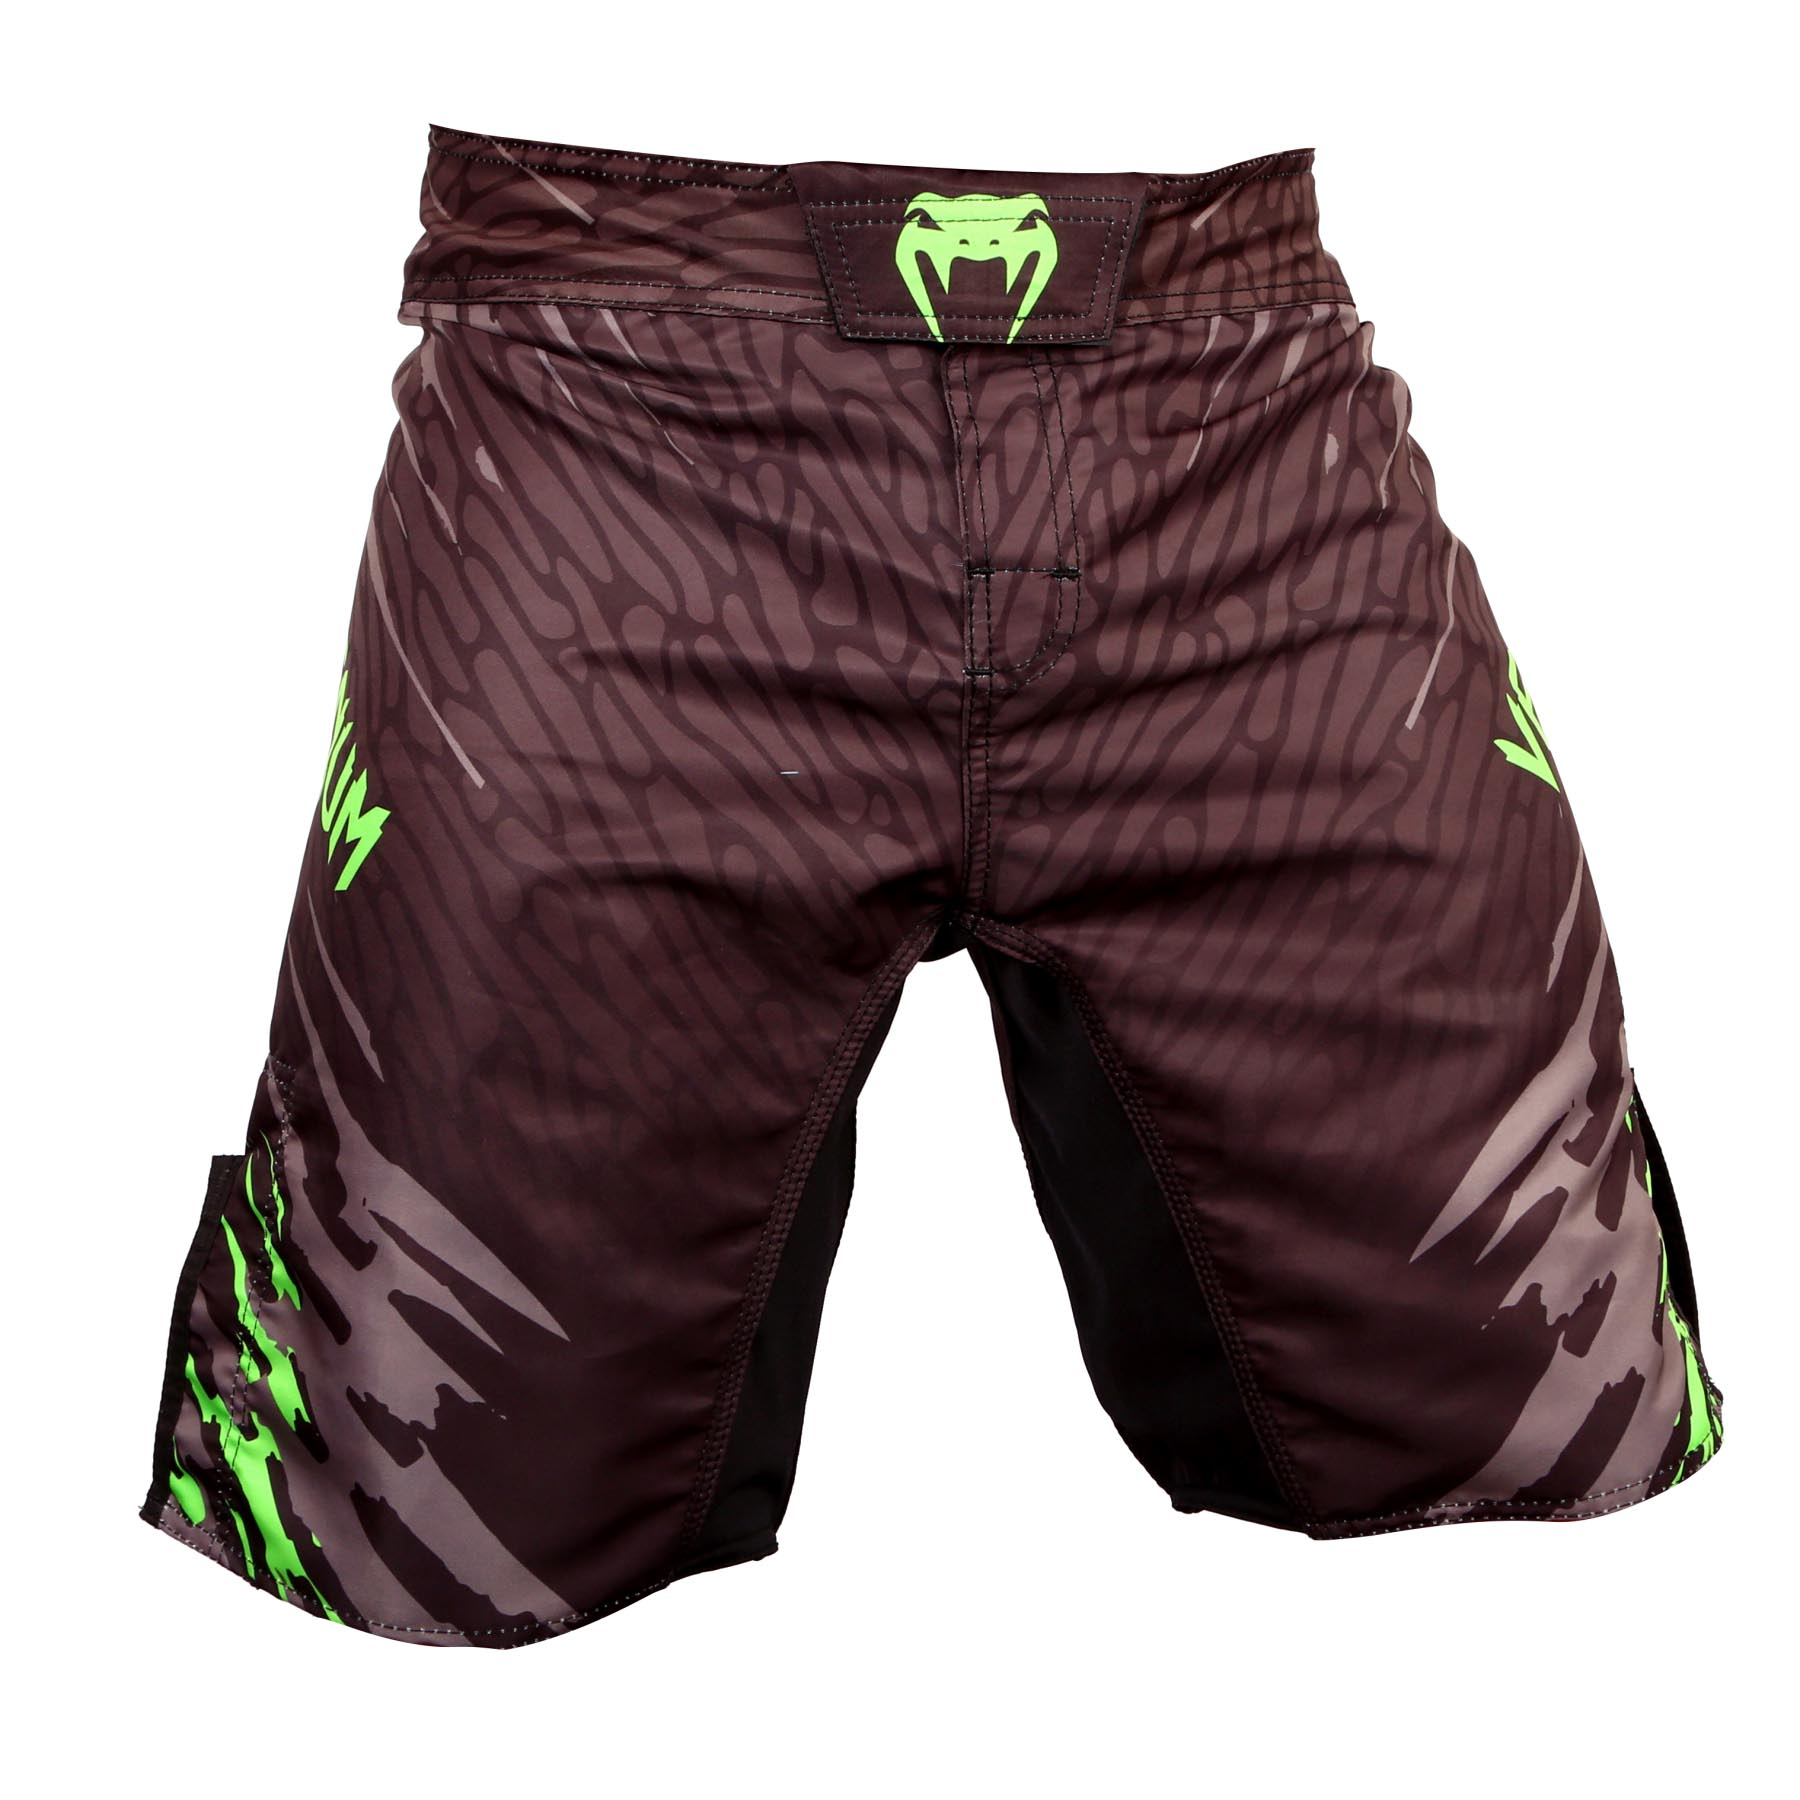 Bermuda MMA - Fireblade- Preto/Verde - Venum -  - Loja do Competidor